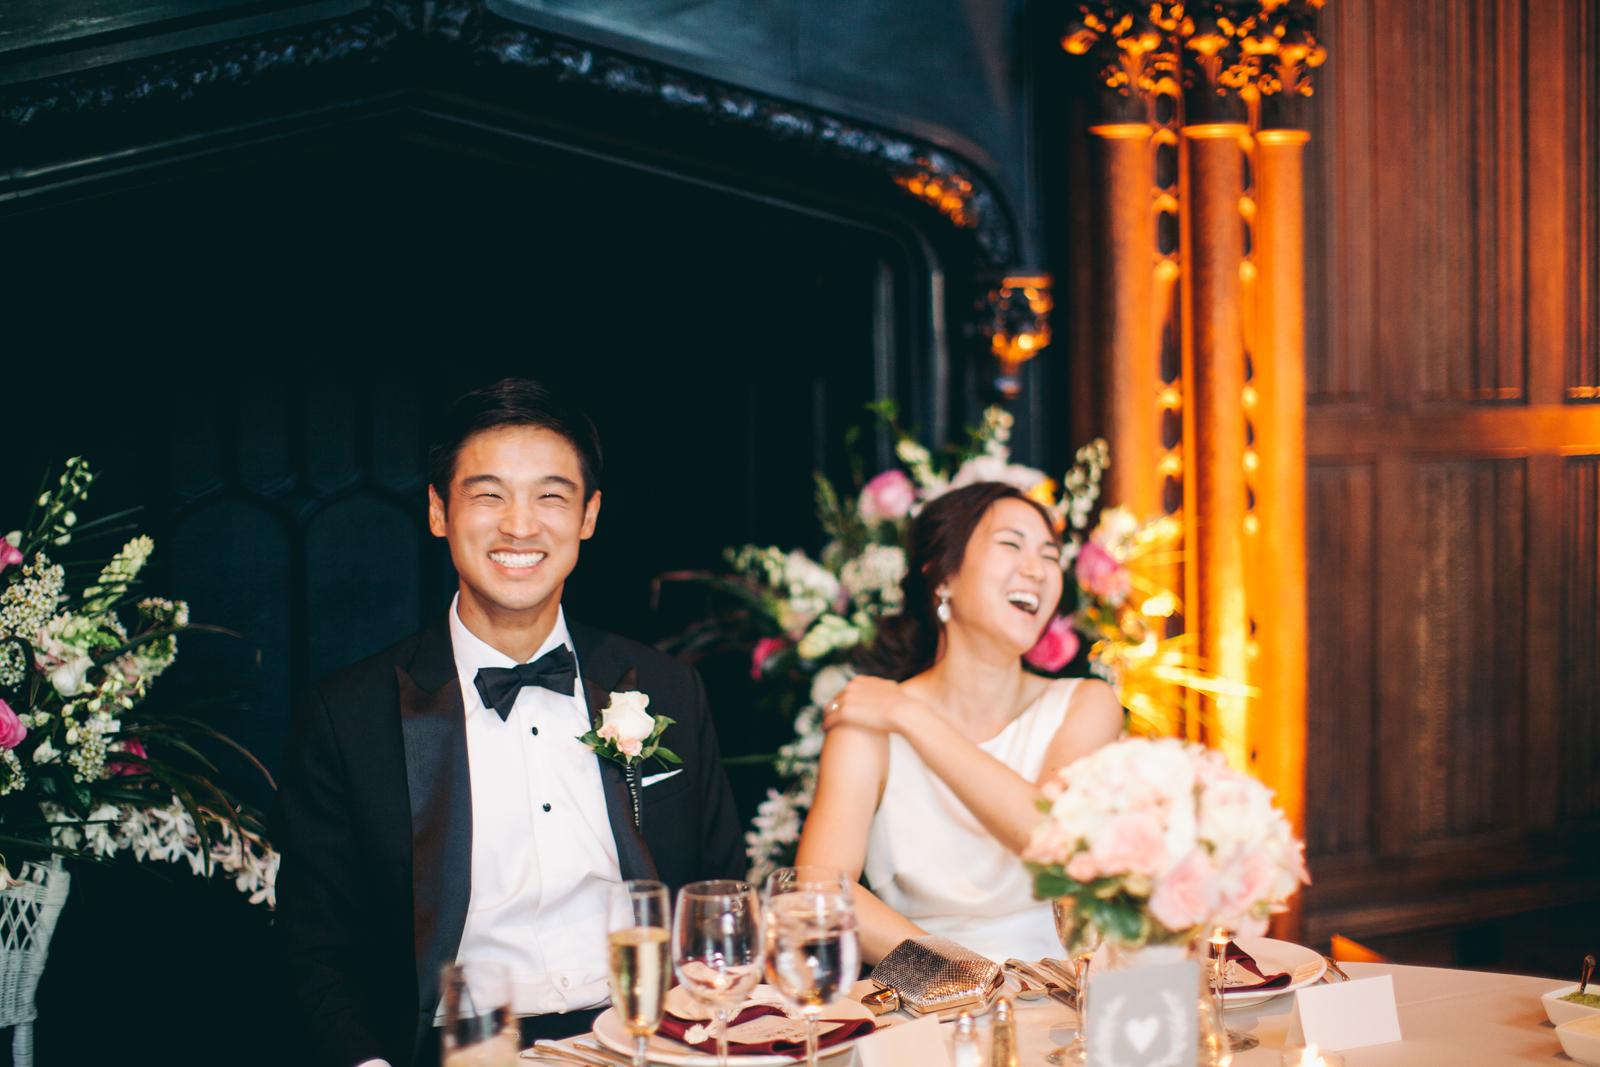 kohl_manison_wedding_photography_sarah_eric_ebony_siovhan_bokeh_photography_091.jpg